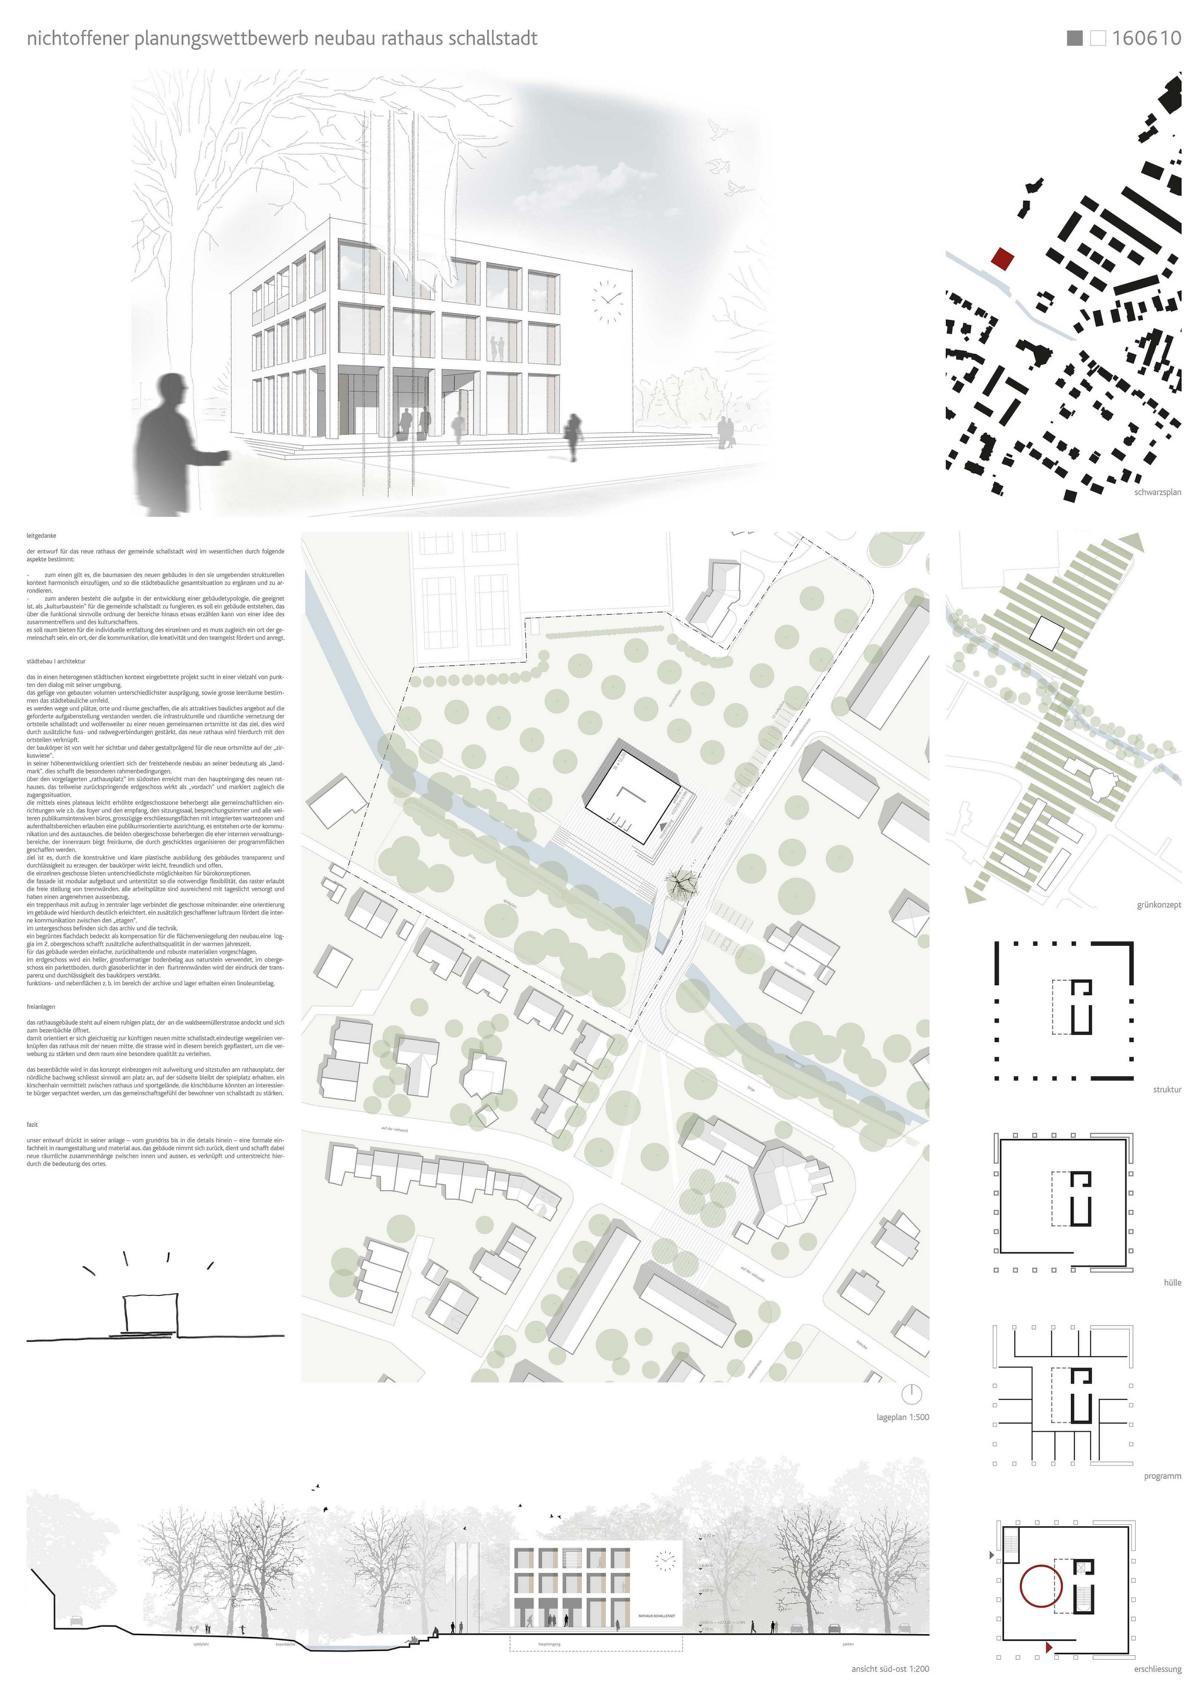 3.Preis_Wittfoht+Jörg Stötzer_Plan 1